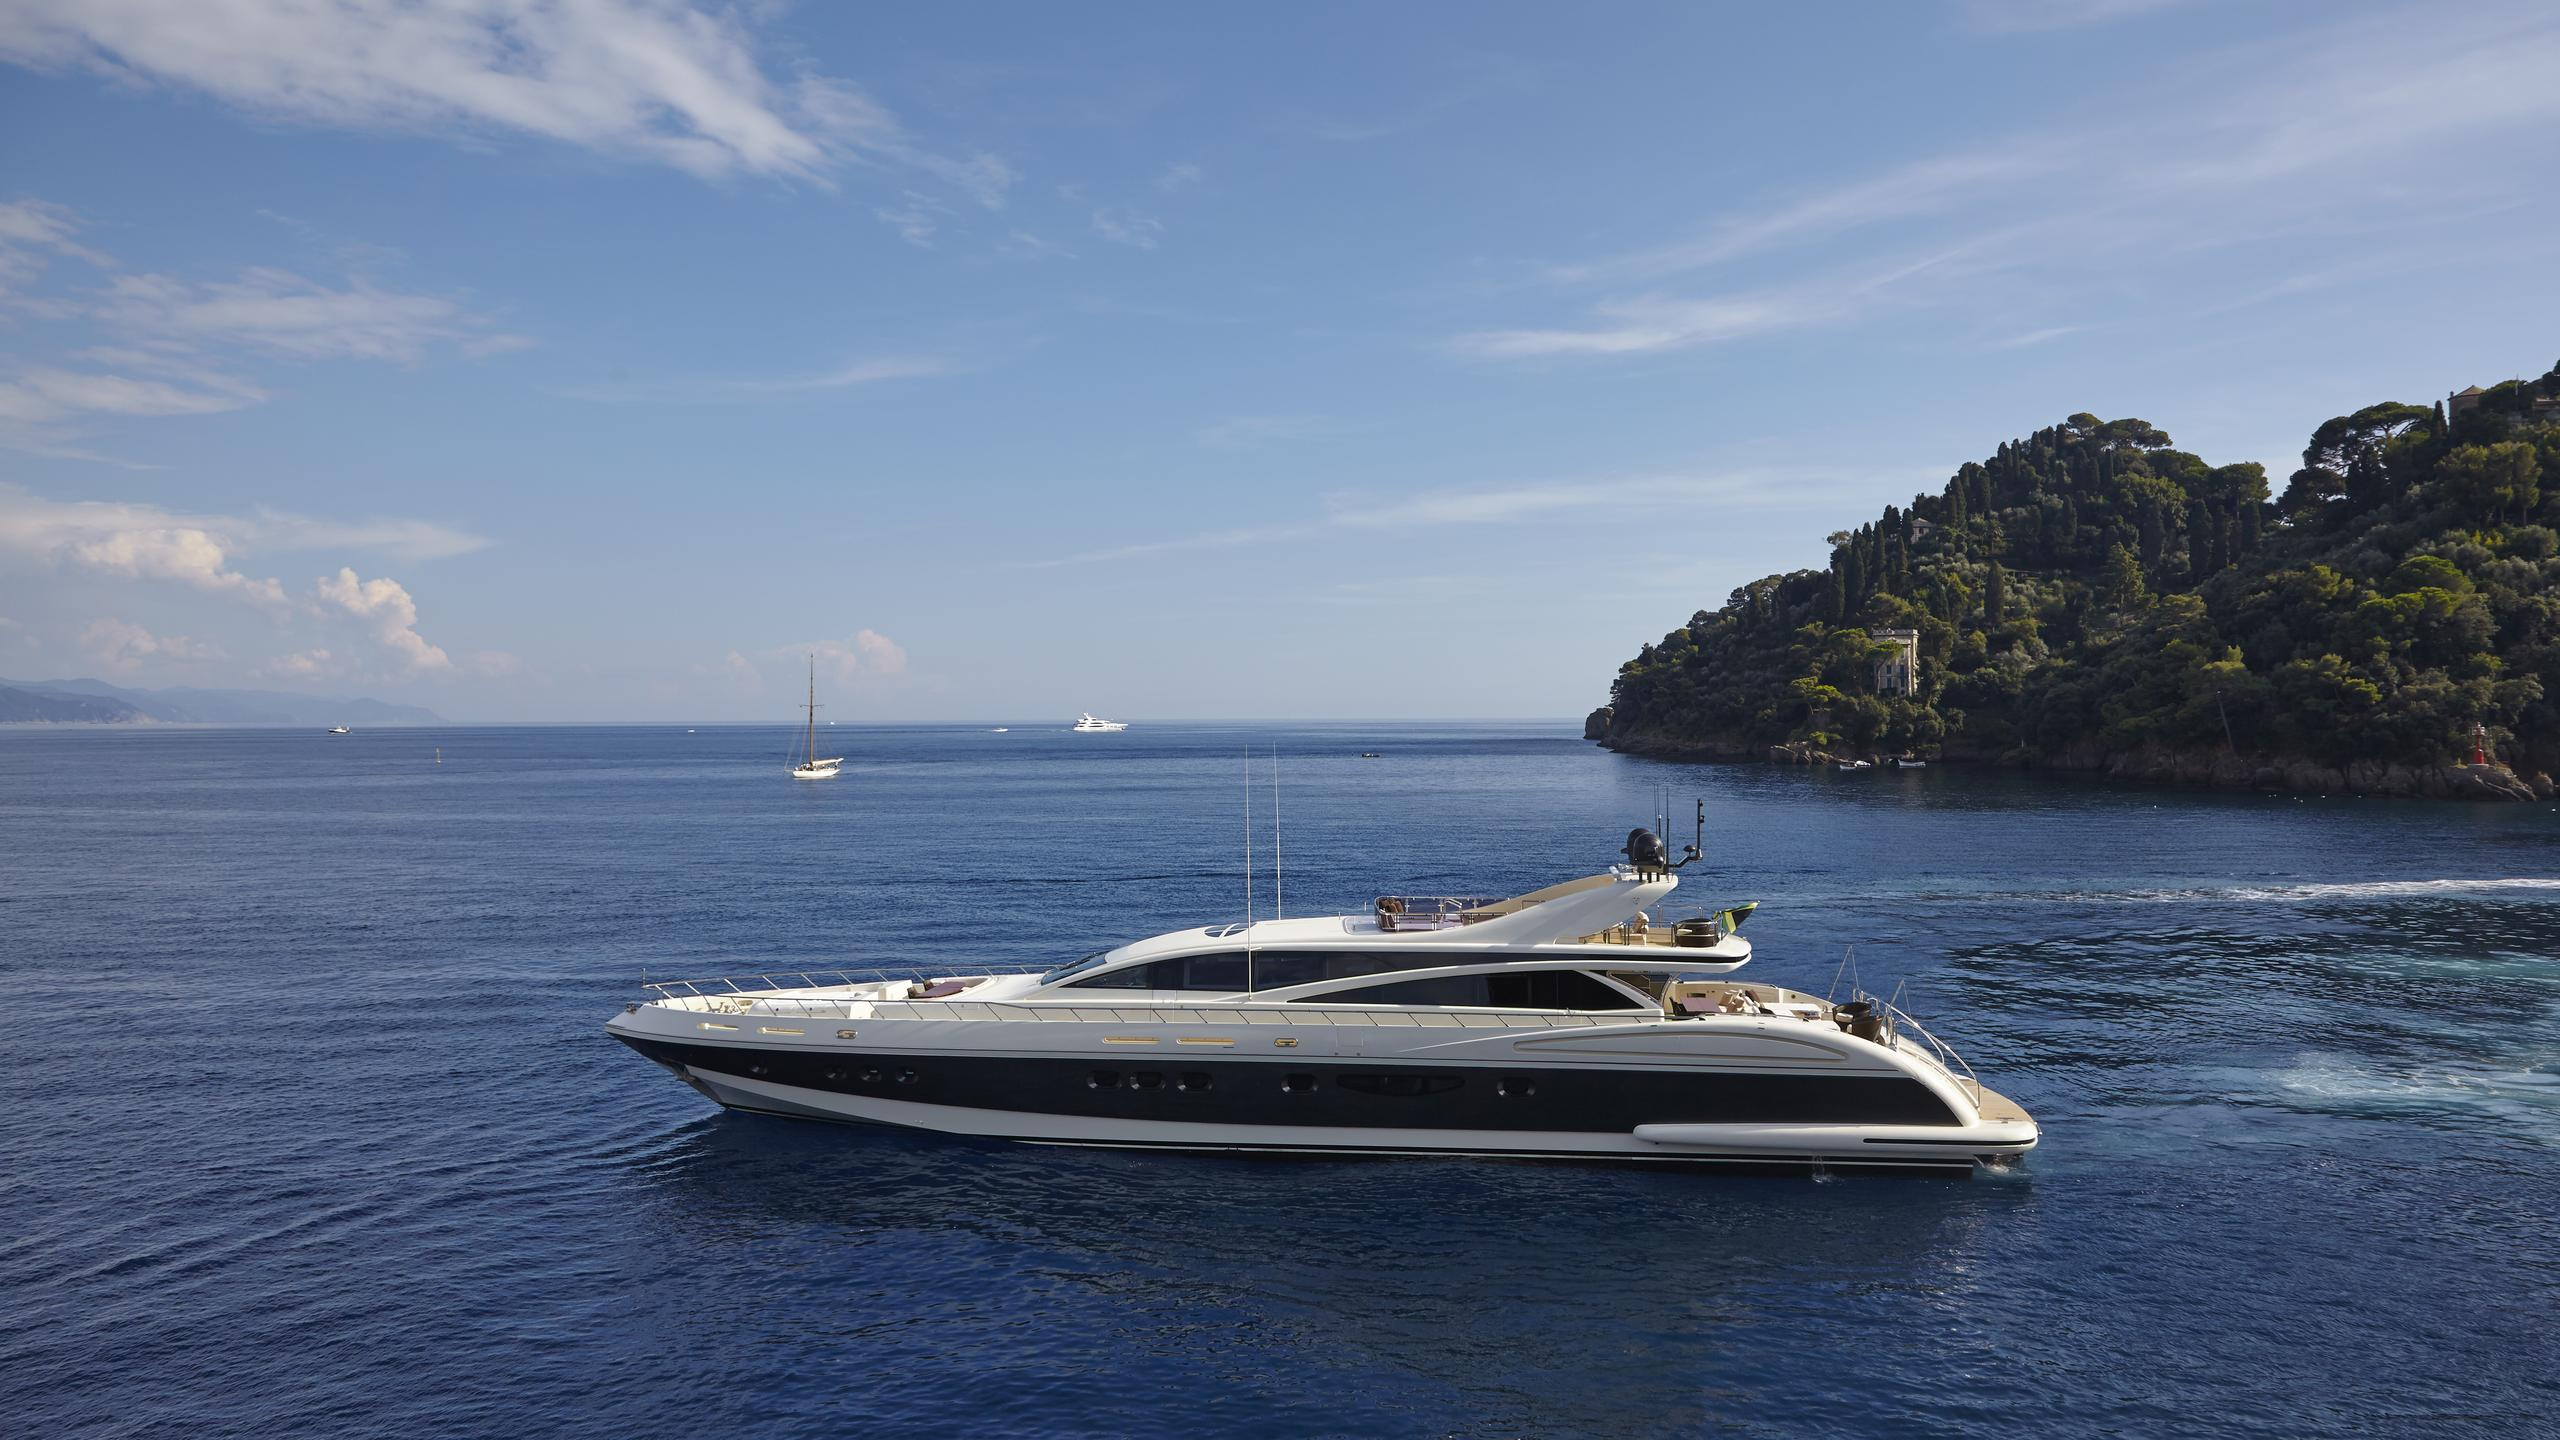 antelope-III-yacht-at-sea